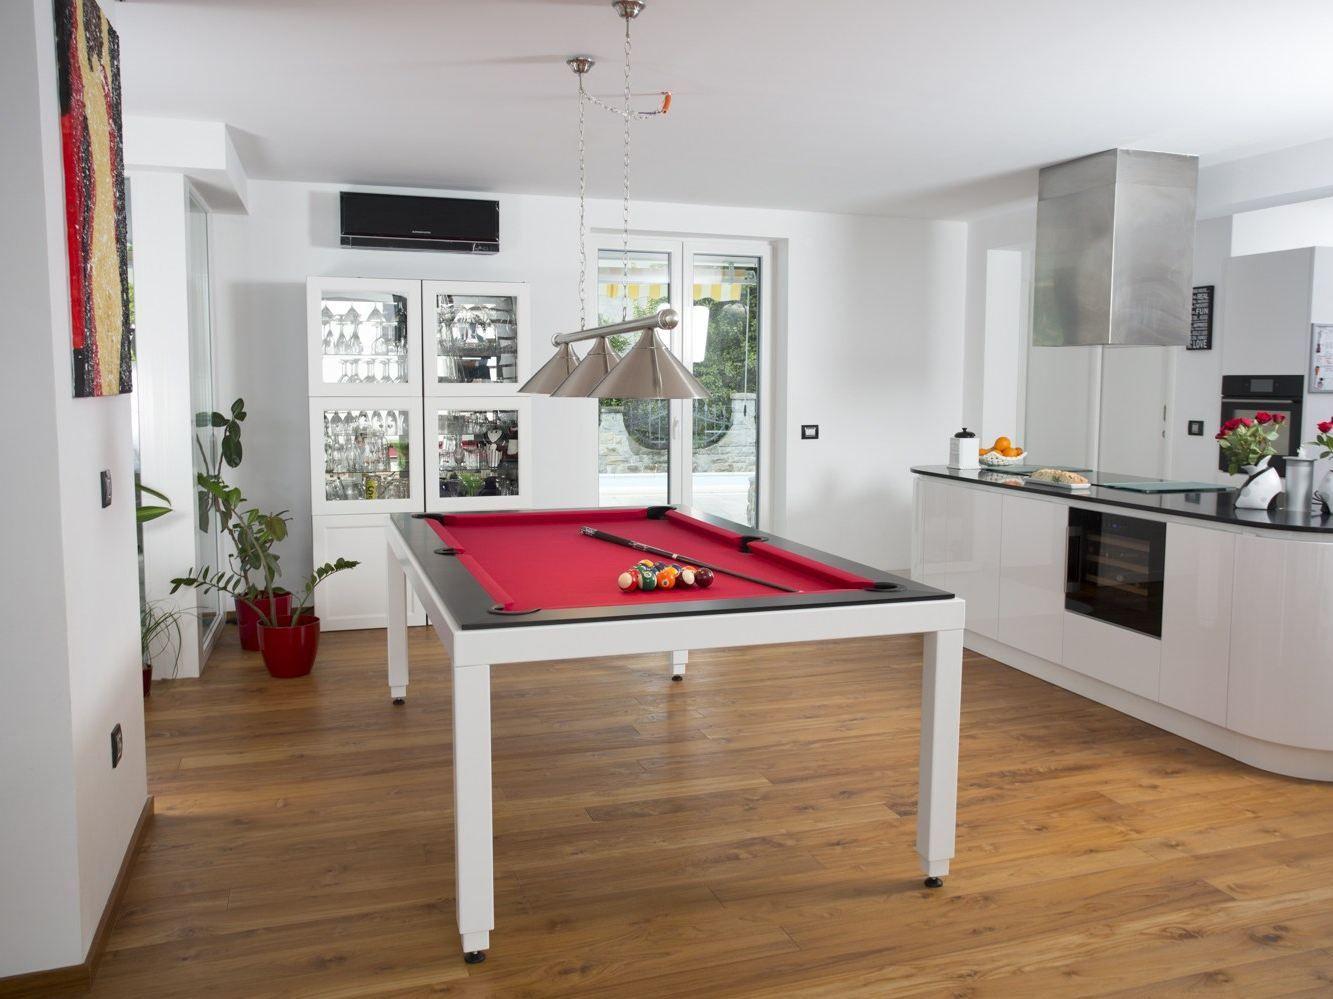 Buy online metalline table by fusiontables saluc steel pool